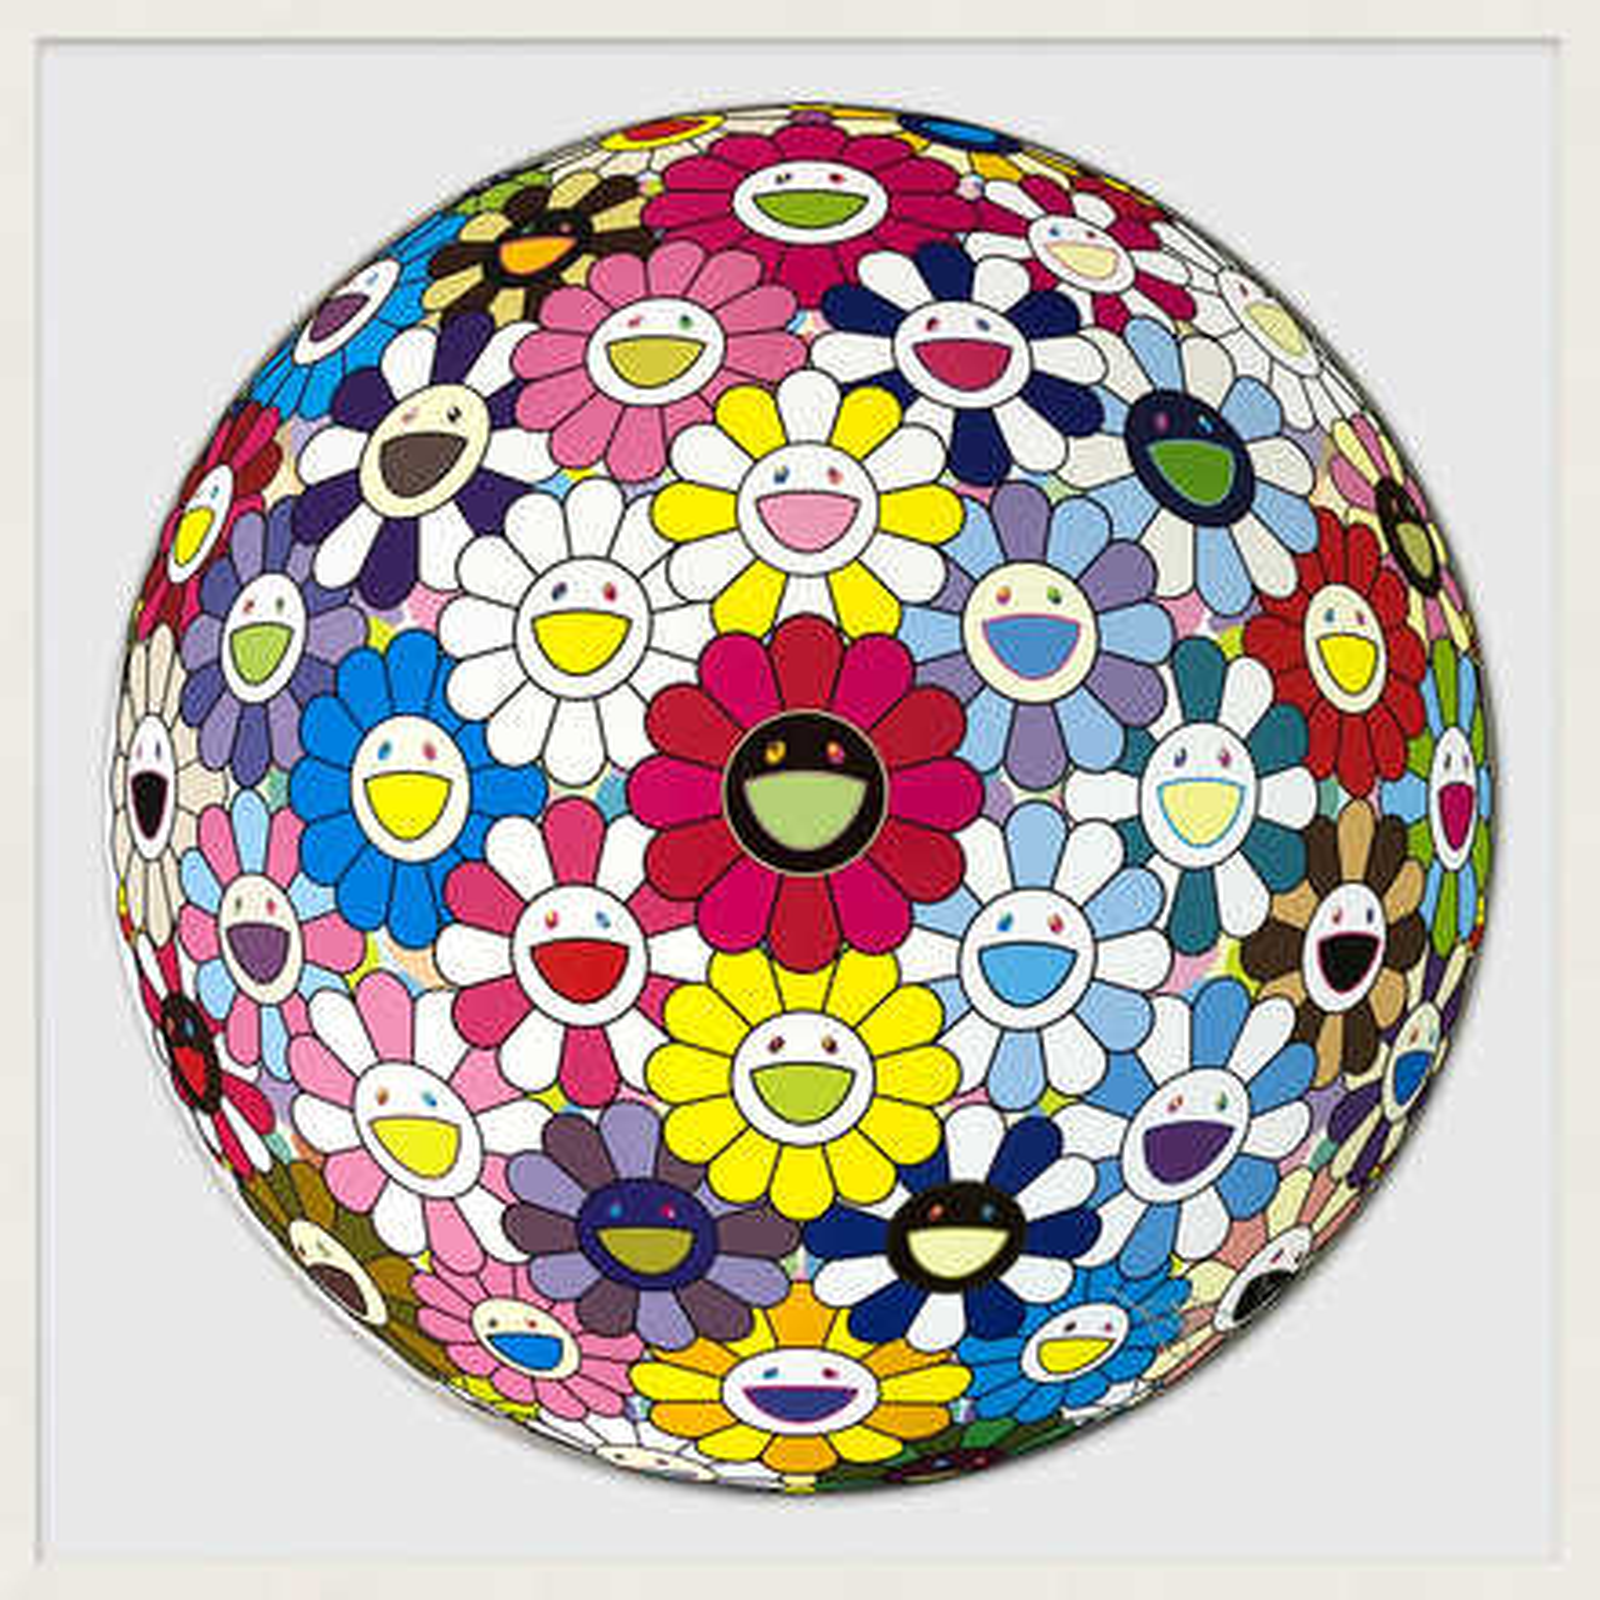 Space Show - Takashi Murakami